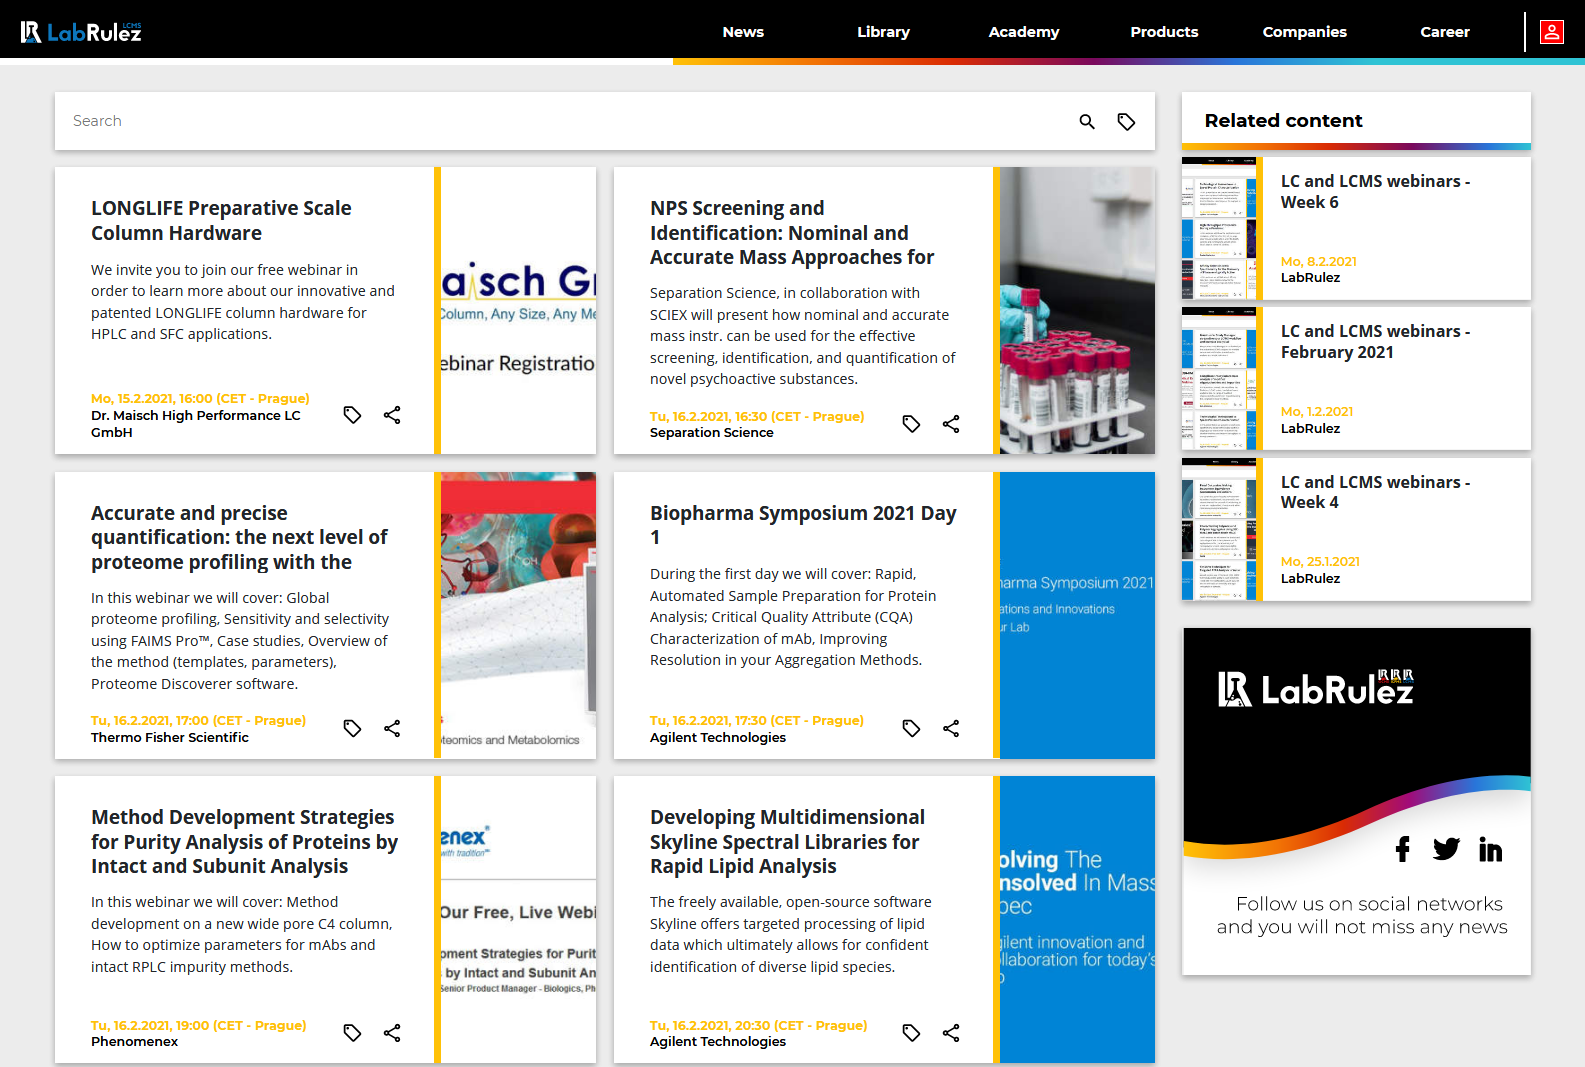 LabRulez: LC and LCMS webinars - Week 7